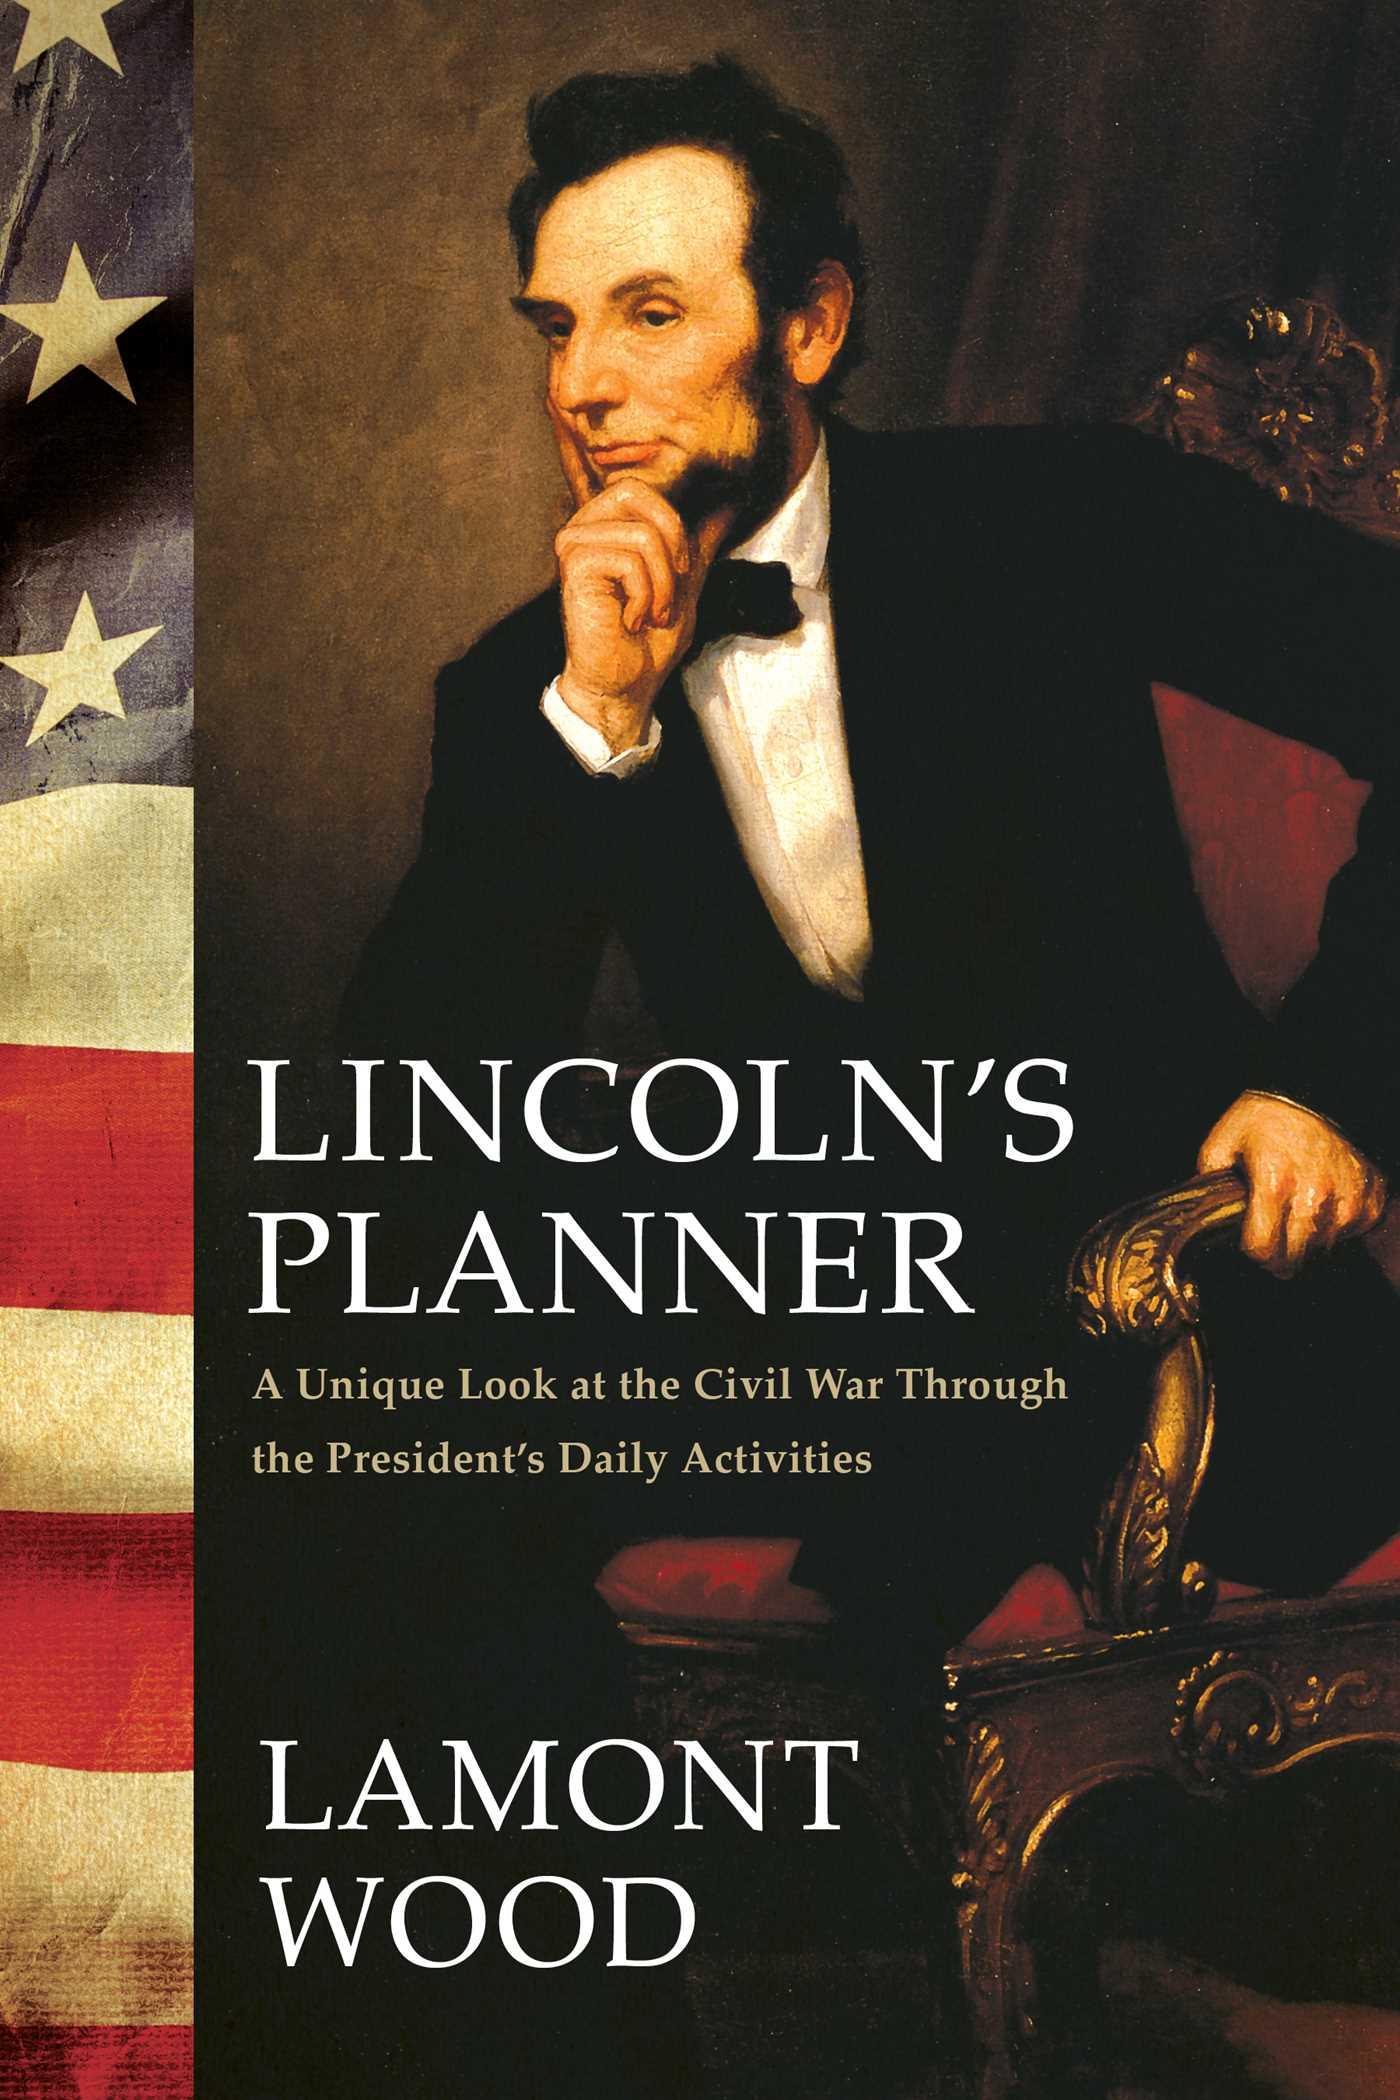 Lincolns planner 9781682616154 hr